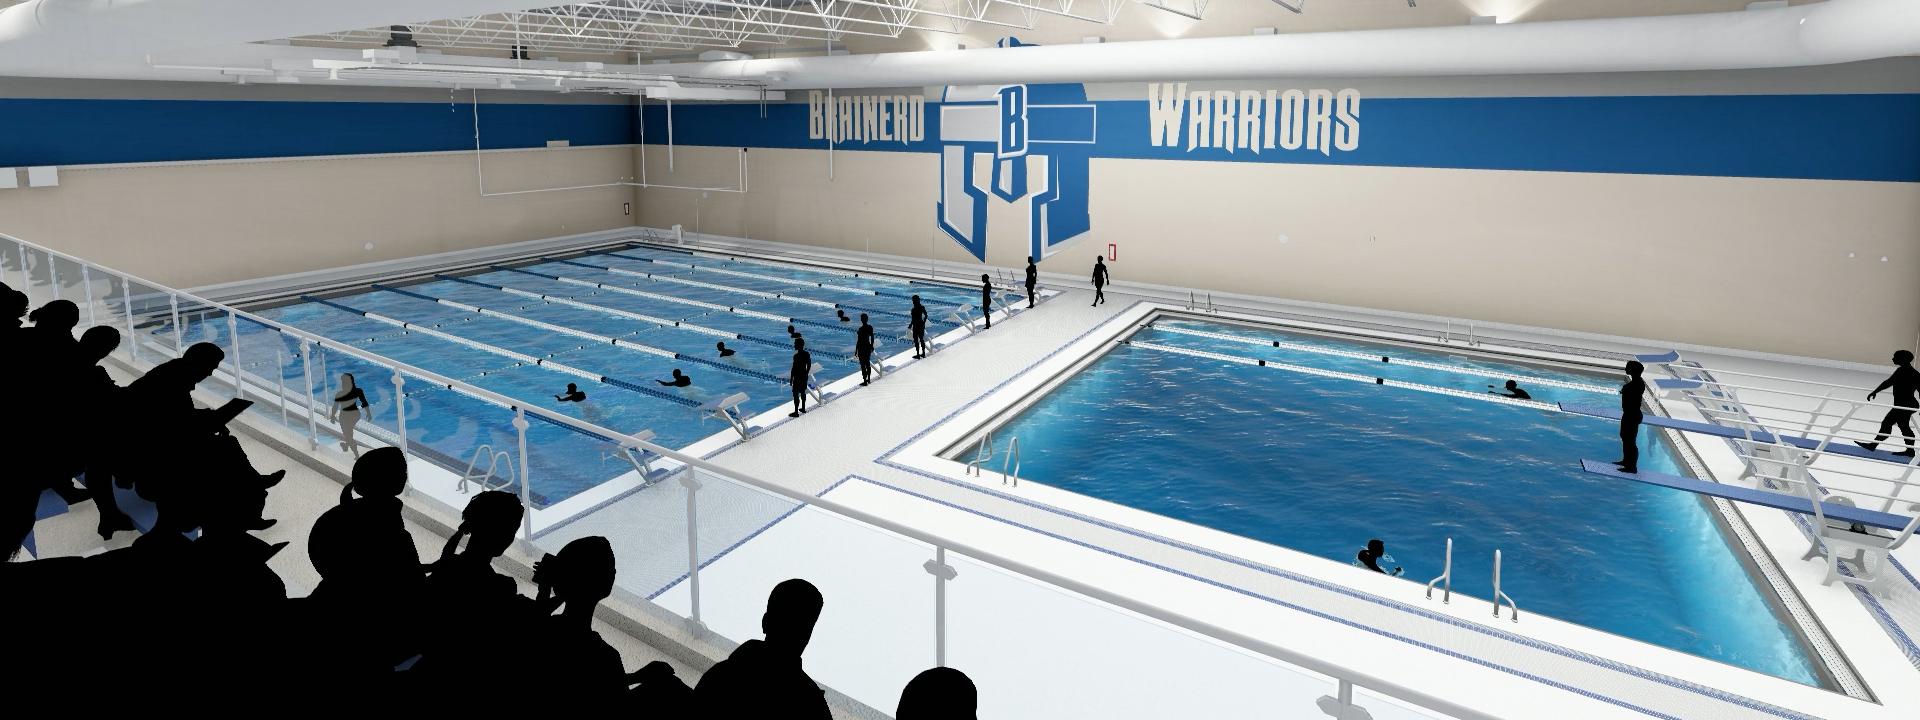 Brainerd High School Swimming Pool, Widseth, K-12 Design